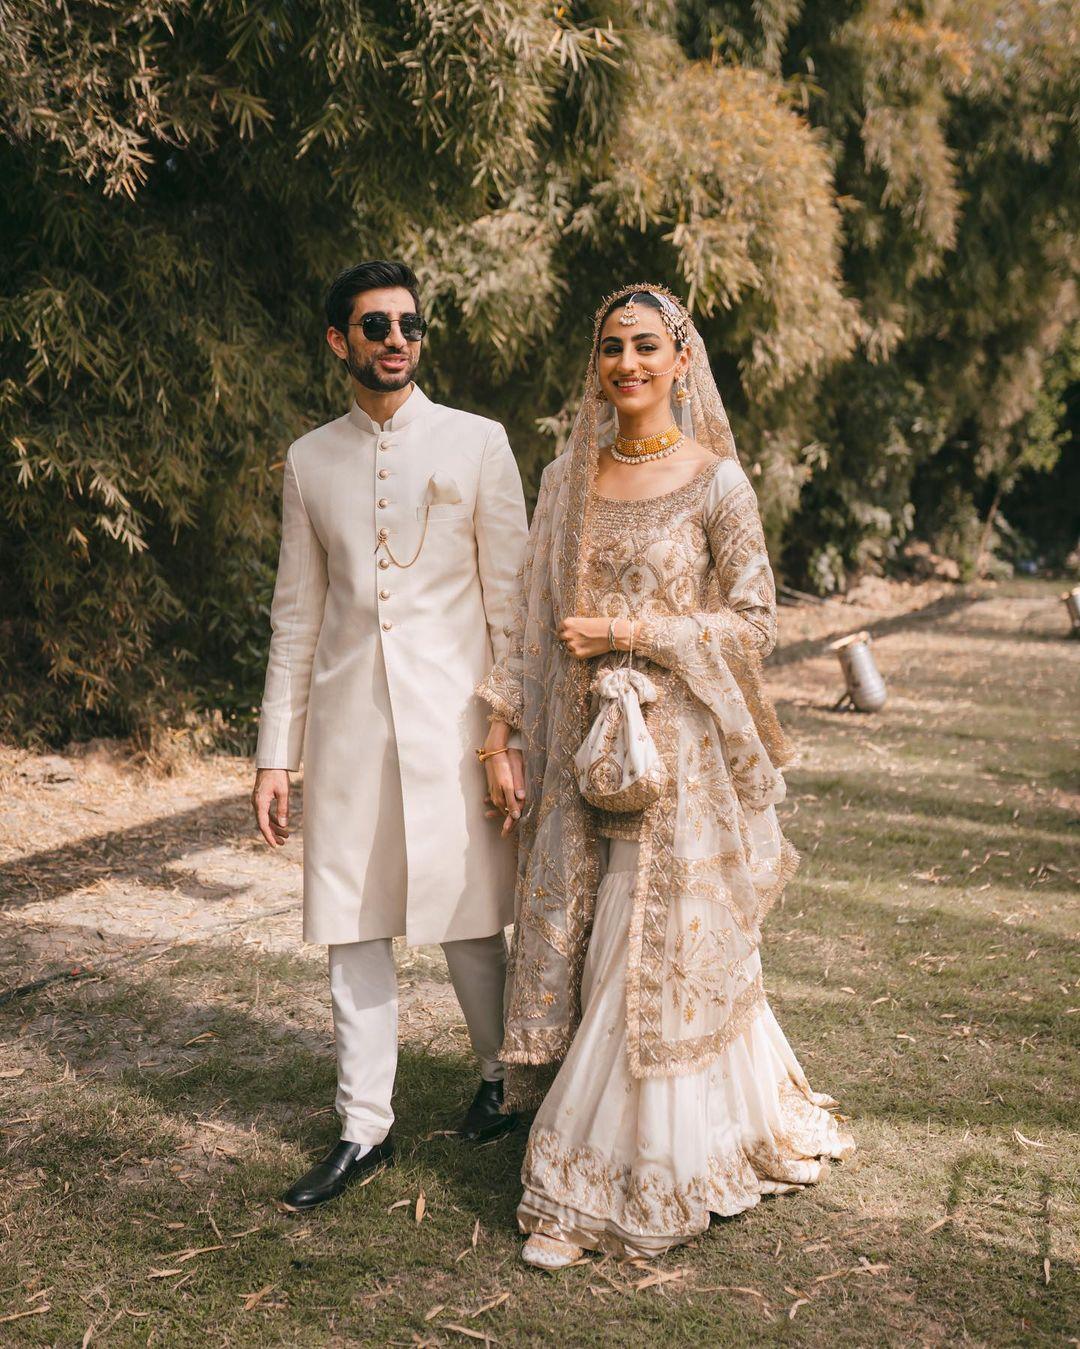 Rehmat Ajmal ties the knot, shares swish wedding ceremony photographs